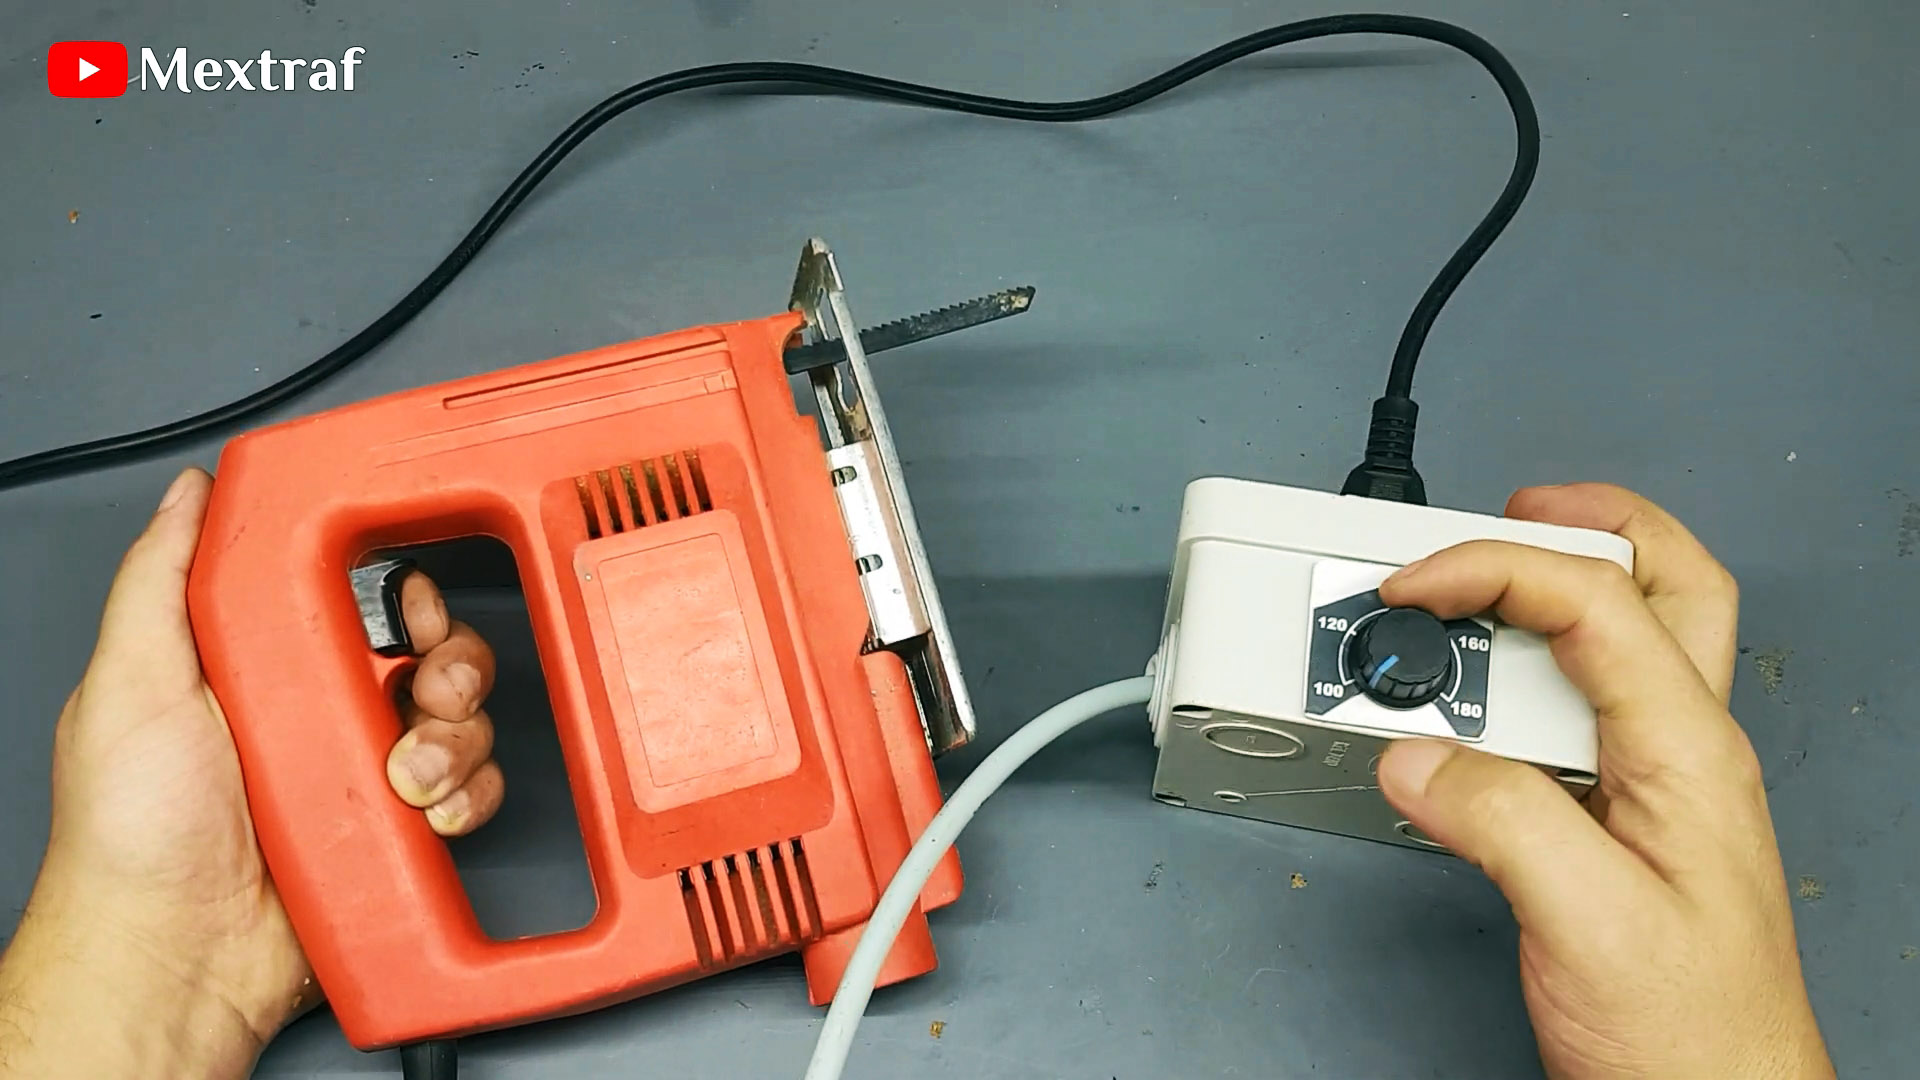 Как сделать регулятор оборотов электроинструмента без знания электроники